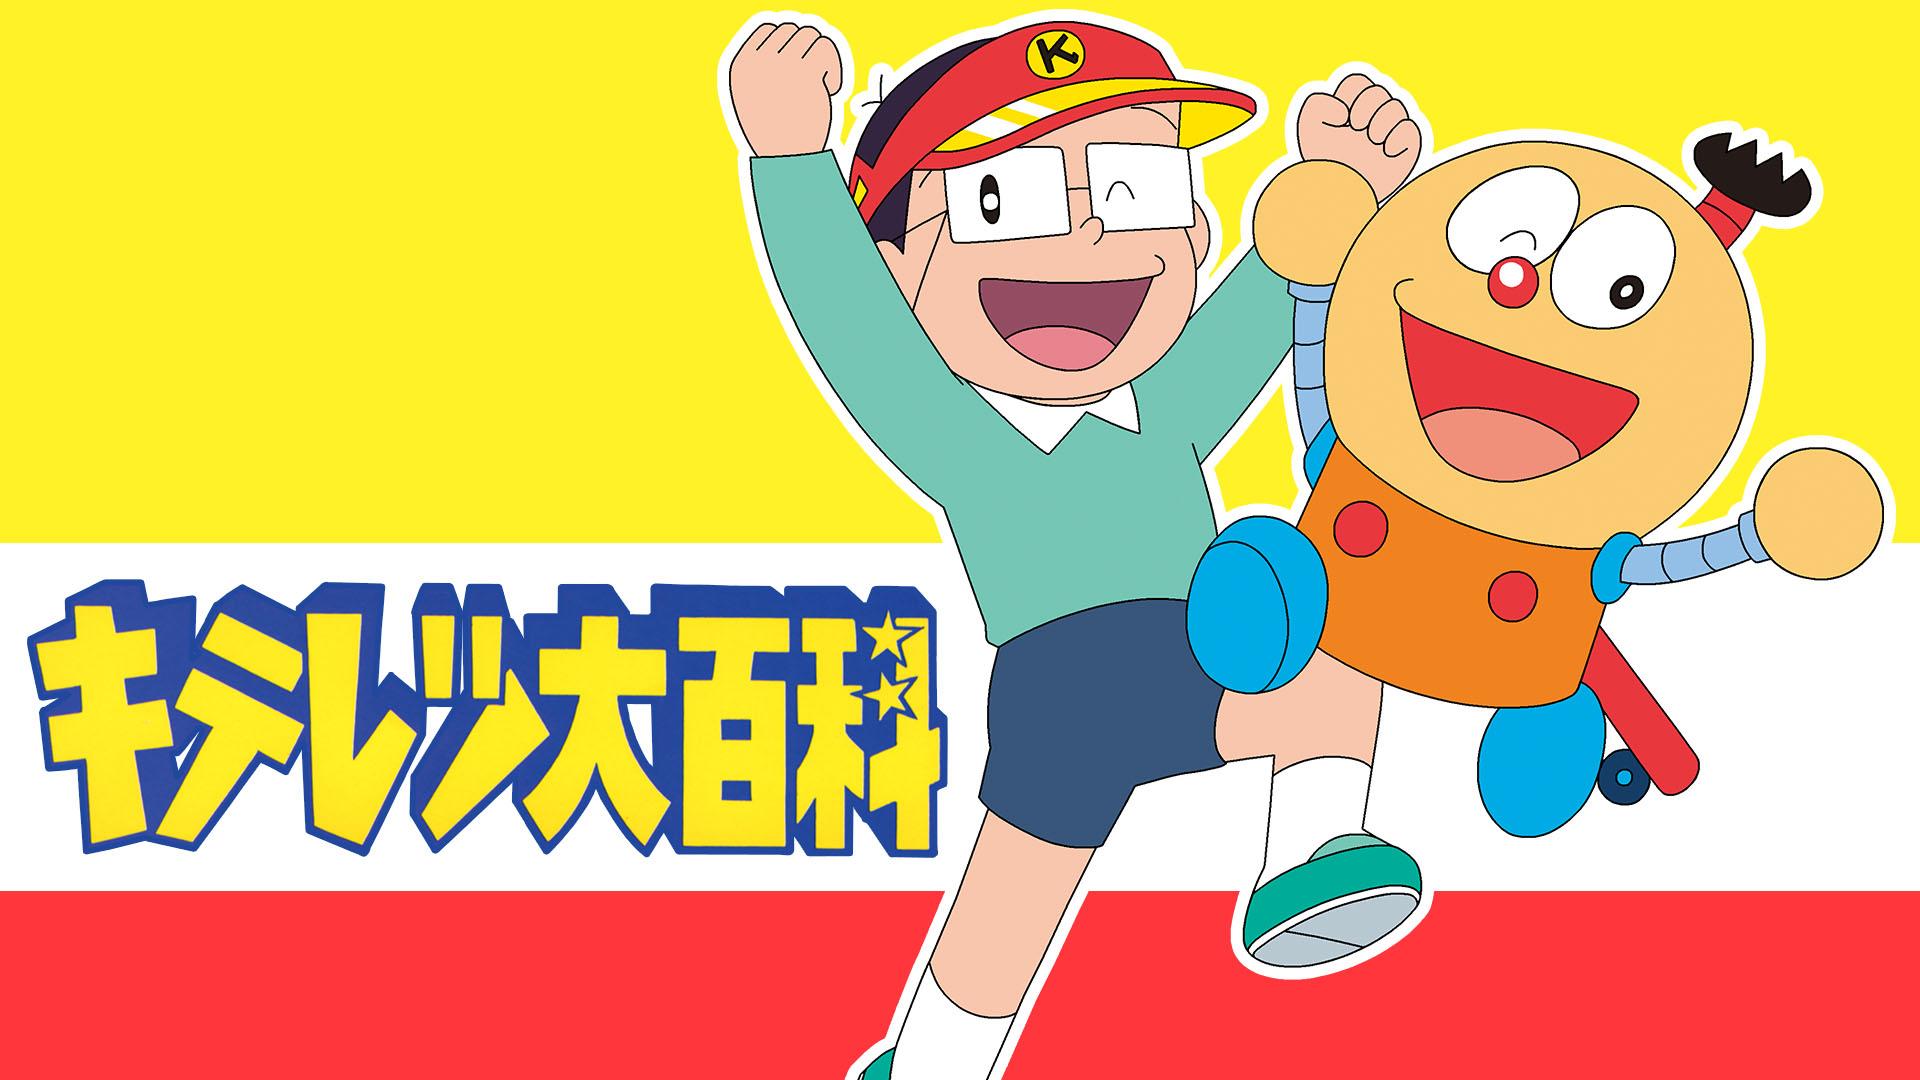 Amazon Co Jp 忍たま乱太郎17シリーズ 第25話 48話 Dアニメストア を観る Prime Video